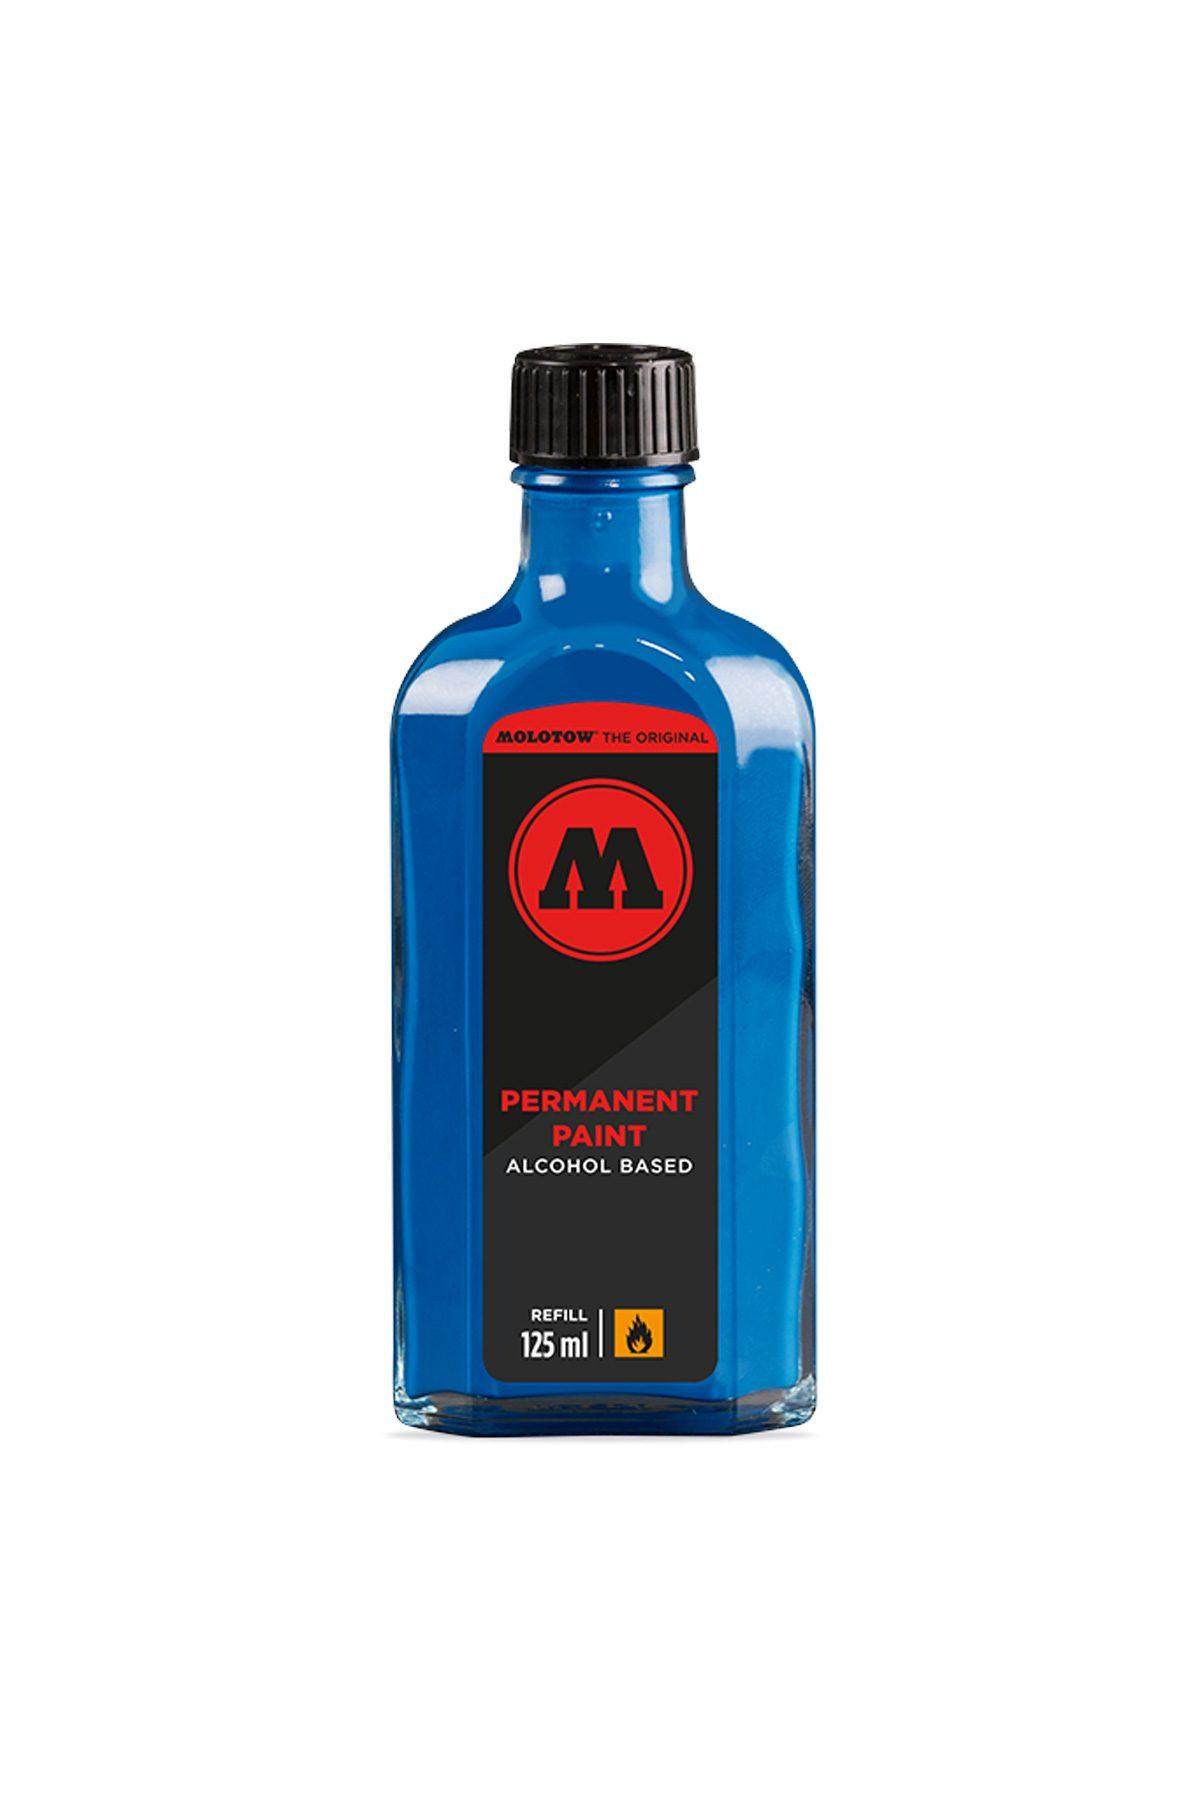 Molotow PERMANENT-PAINT Refill 125ml